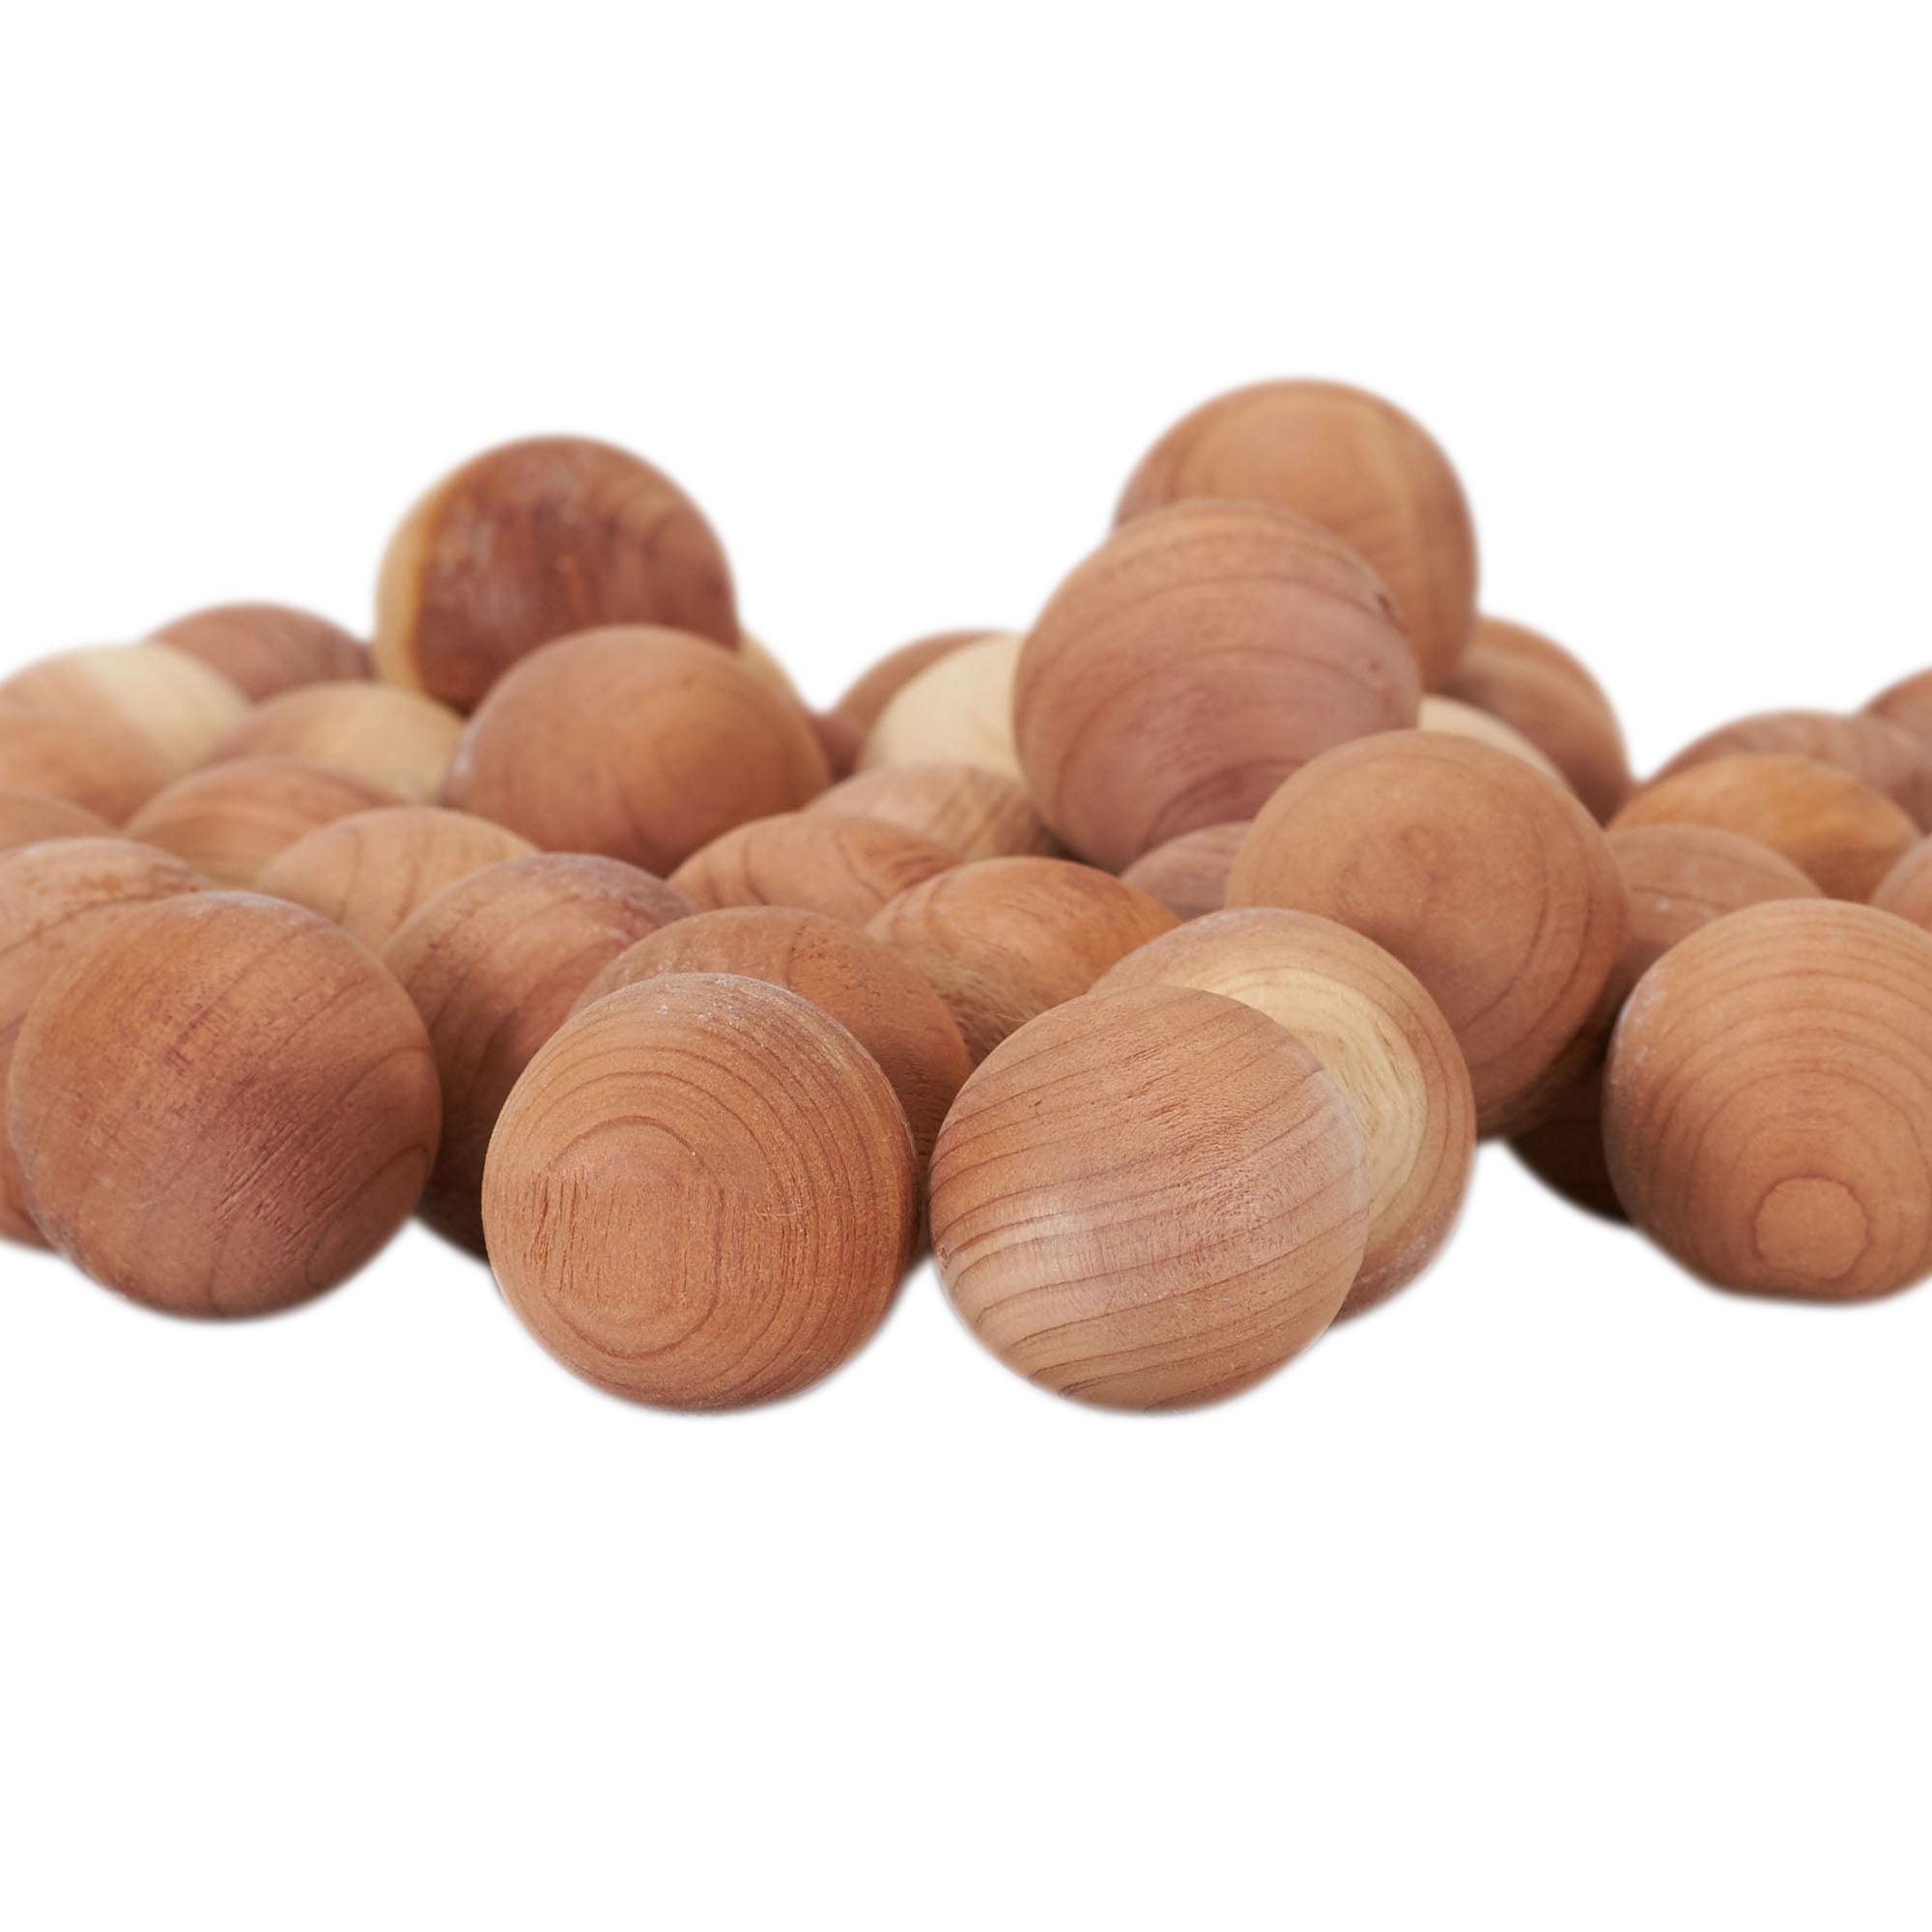 Household Essentials Cedar Balls, 40-Count